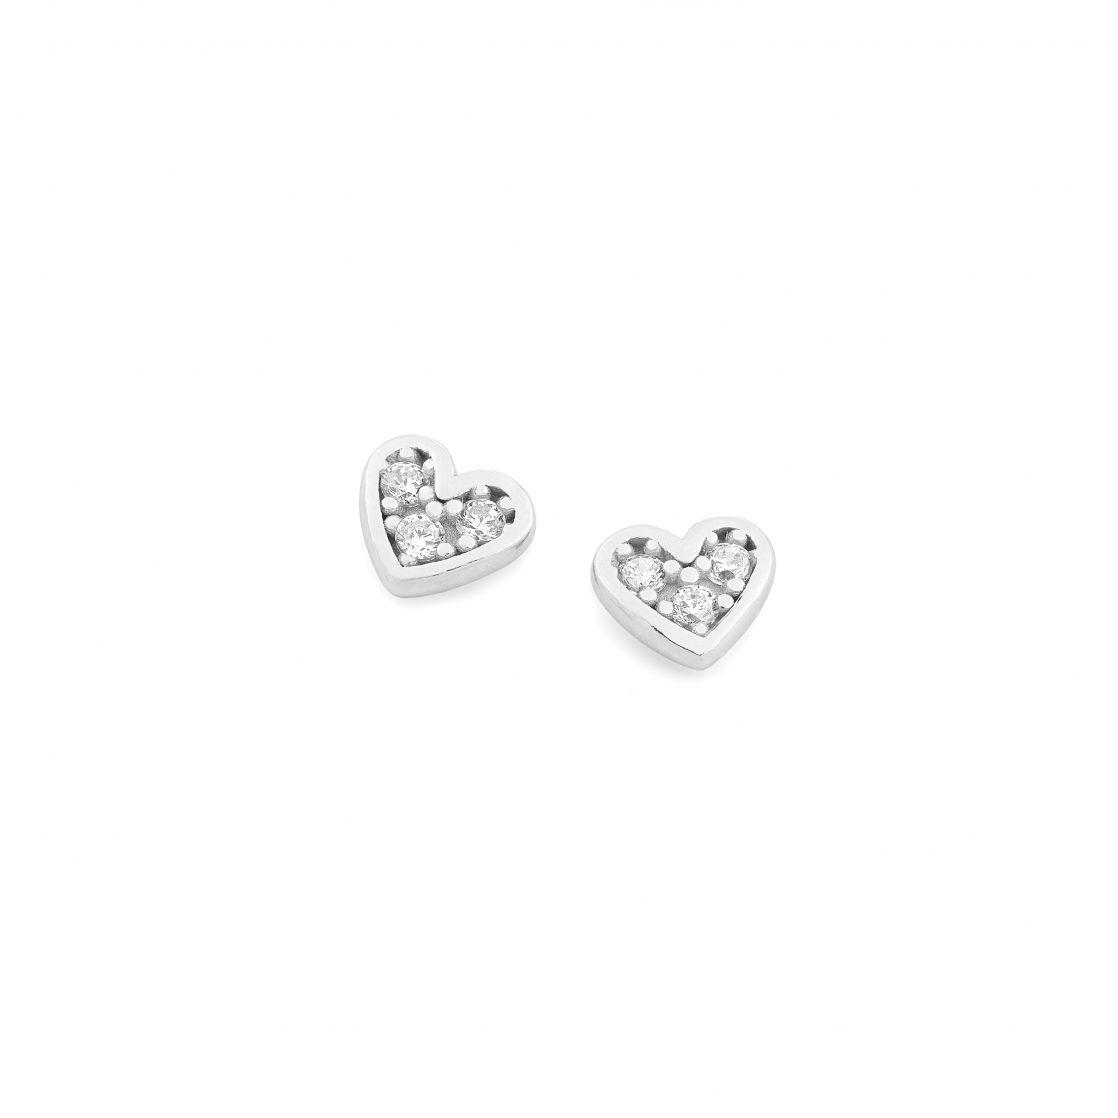 Pave' Heart Stud Earrings